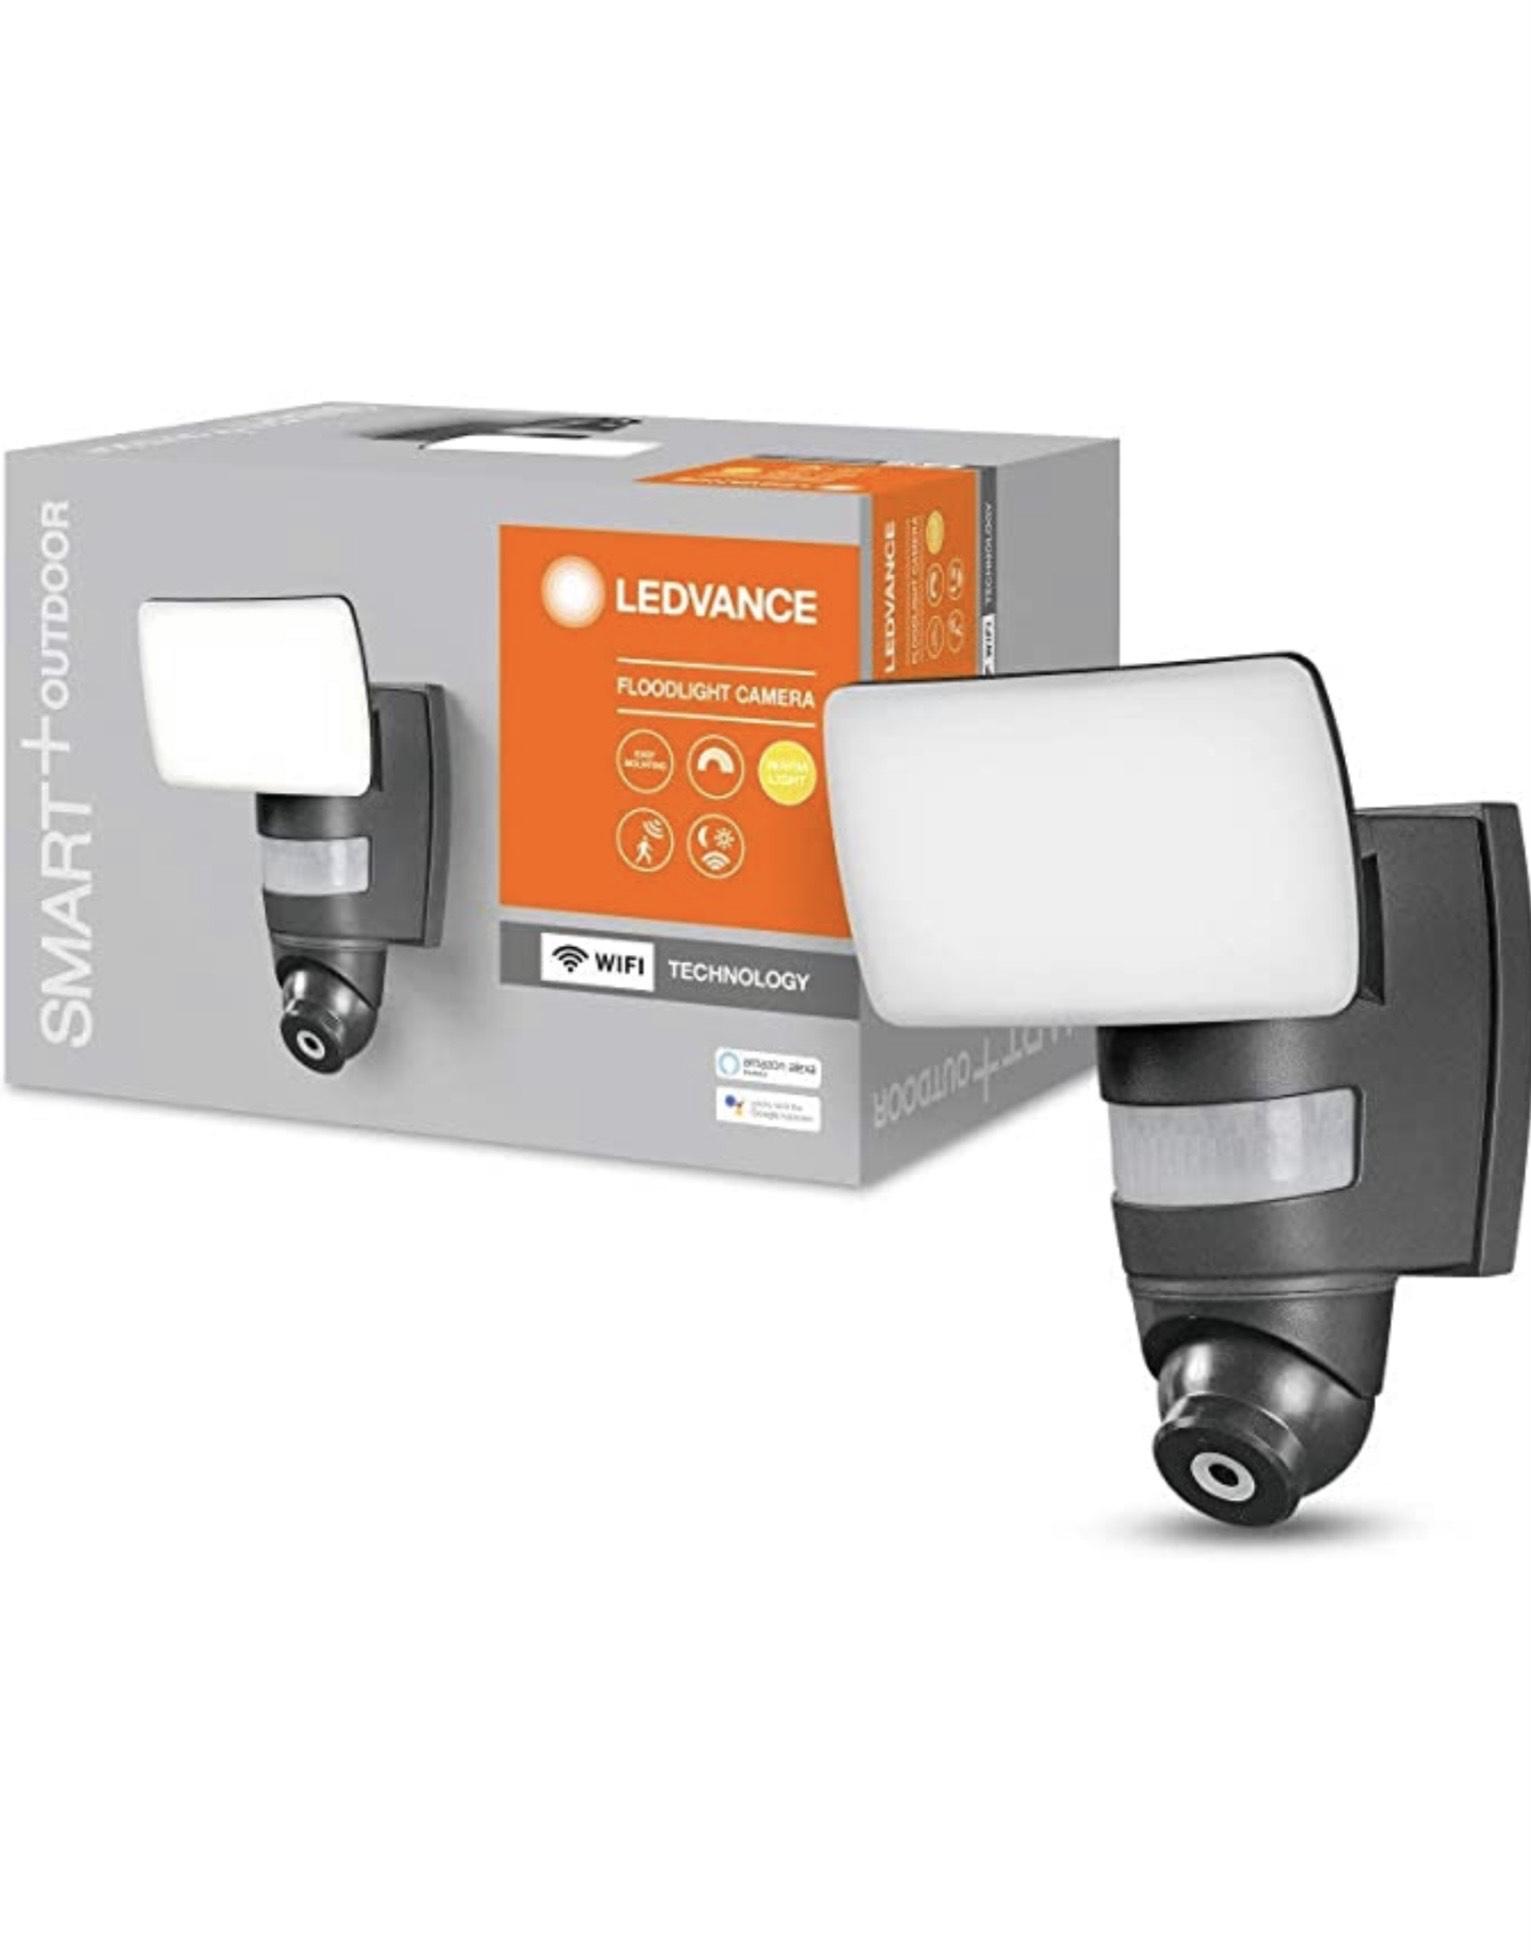 LEDVANCE Wifi Kameraleuchte für 99 Euro